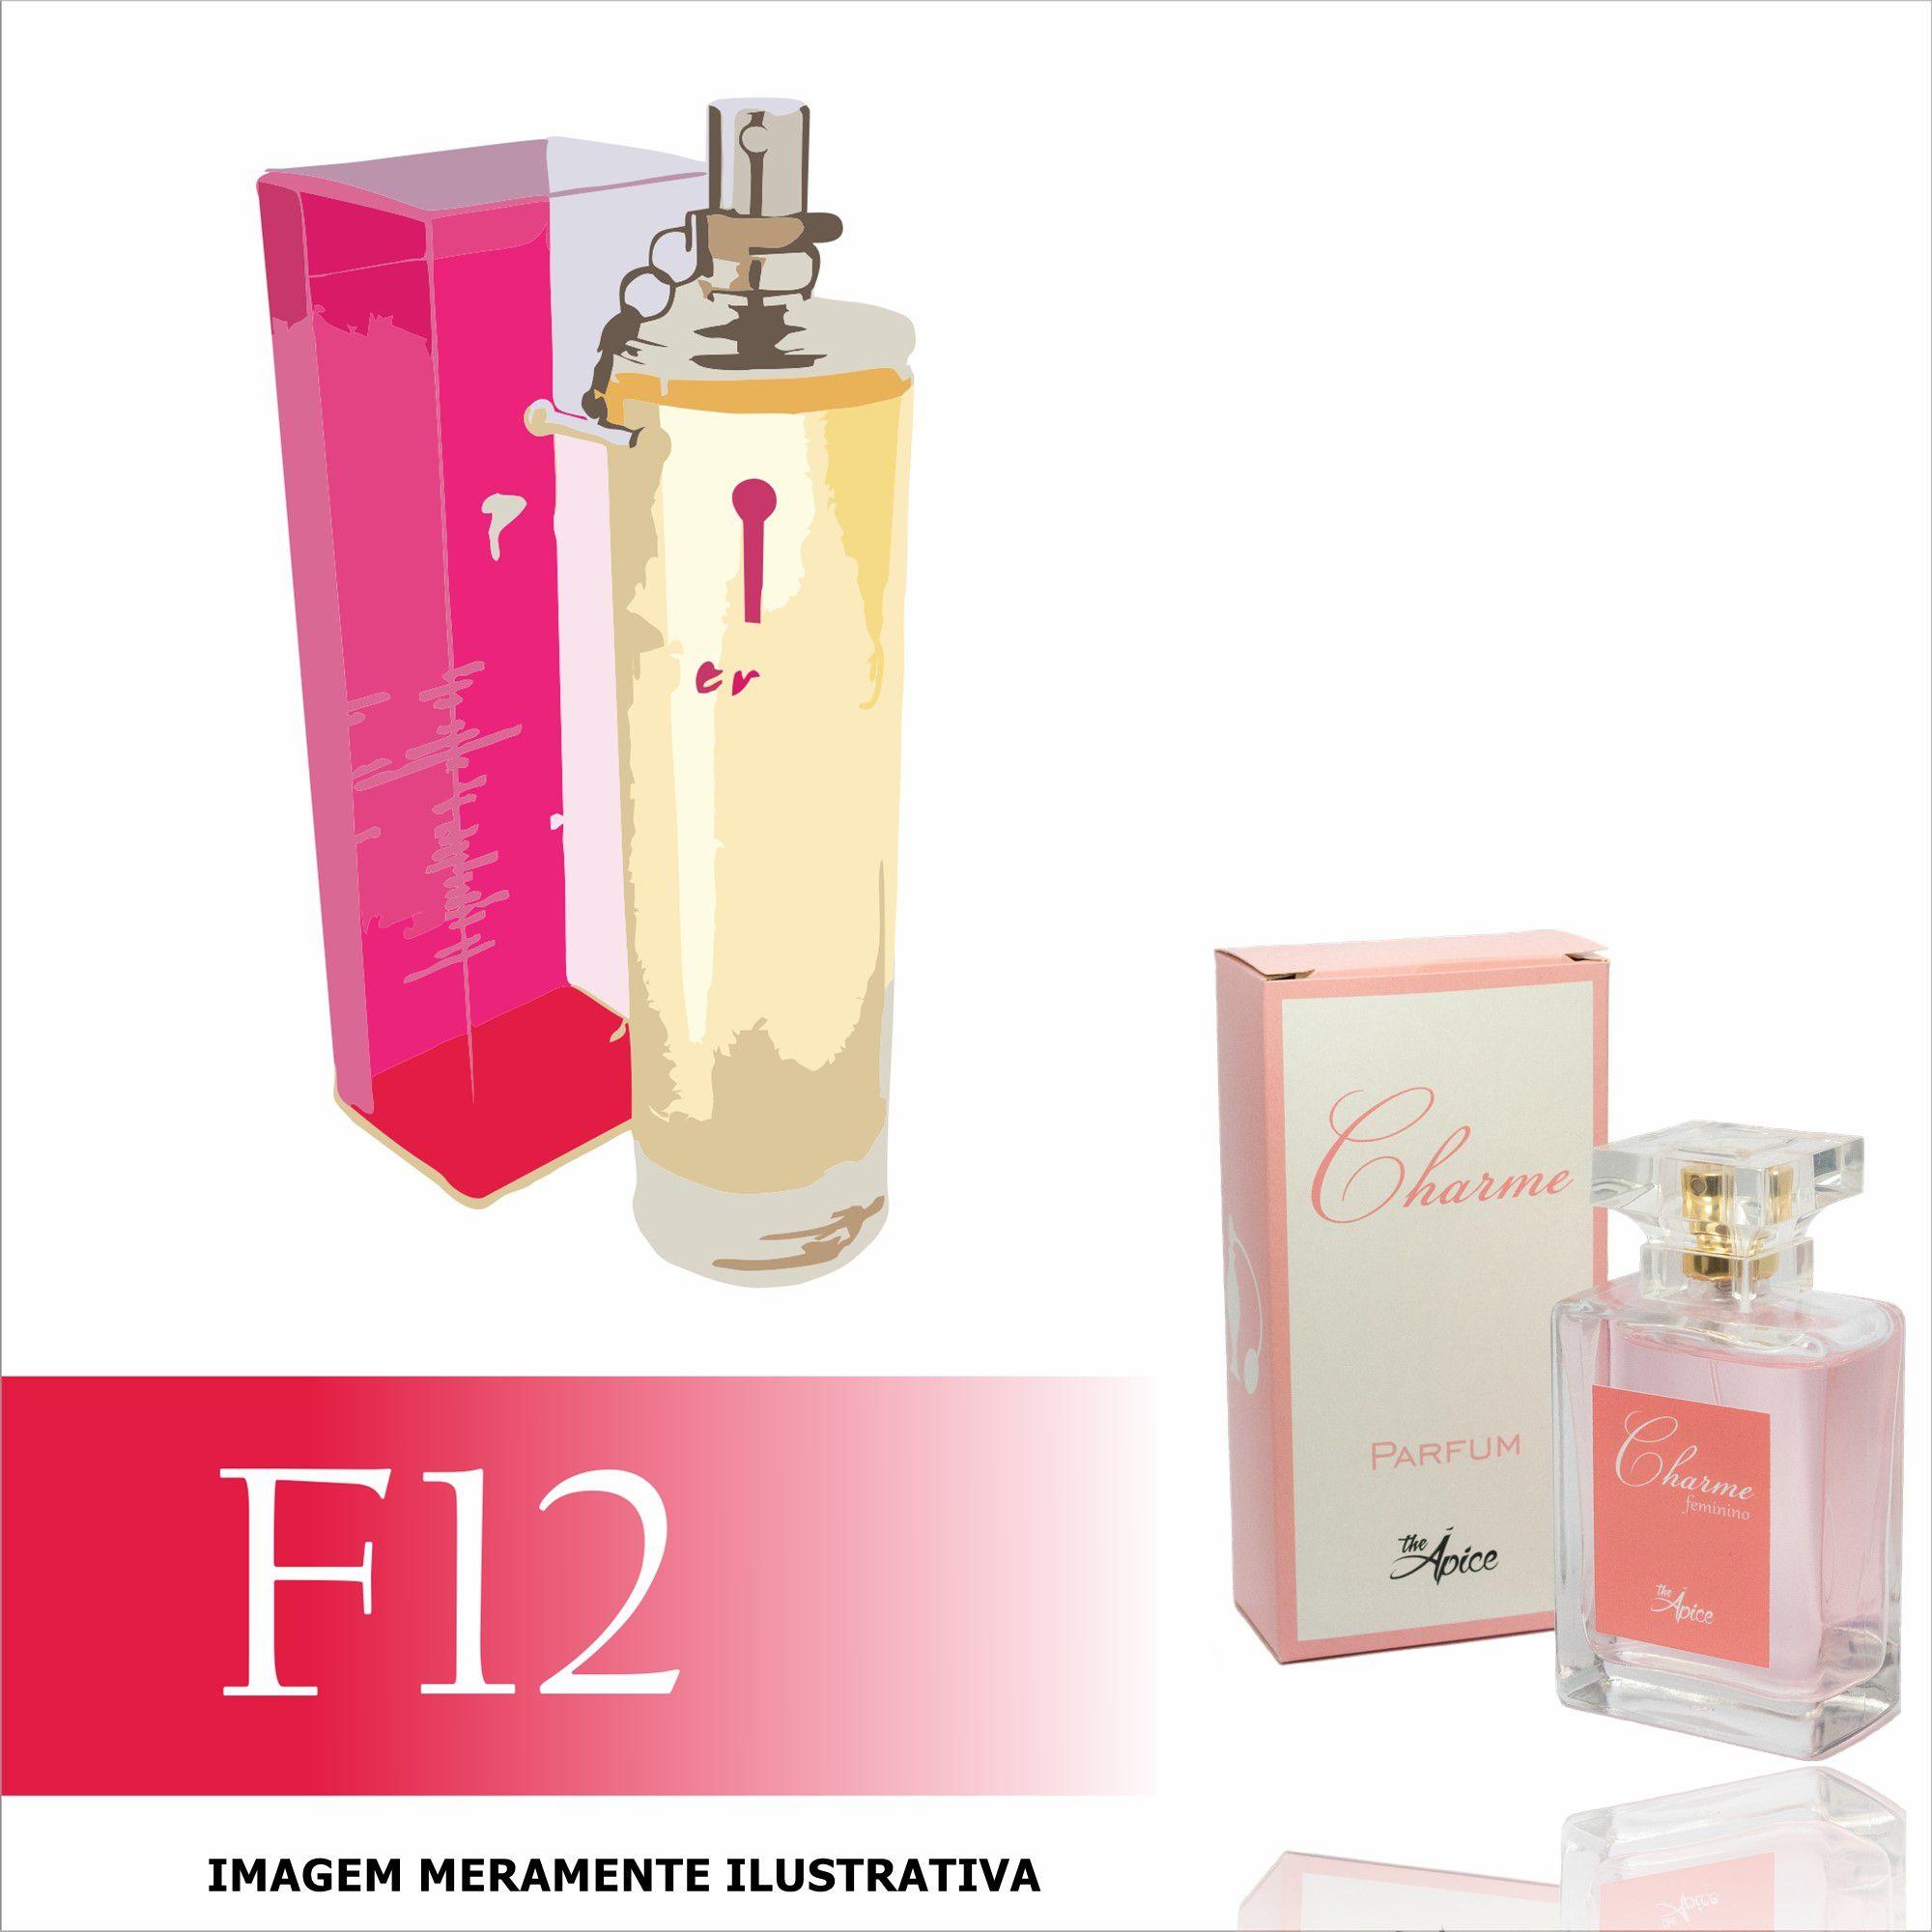 Perfume F12 Inspirado no Piercing ela da L'acqua Di Fiori Feminino